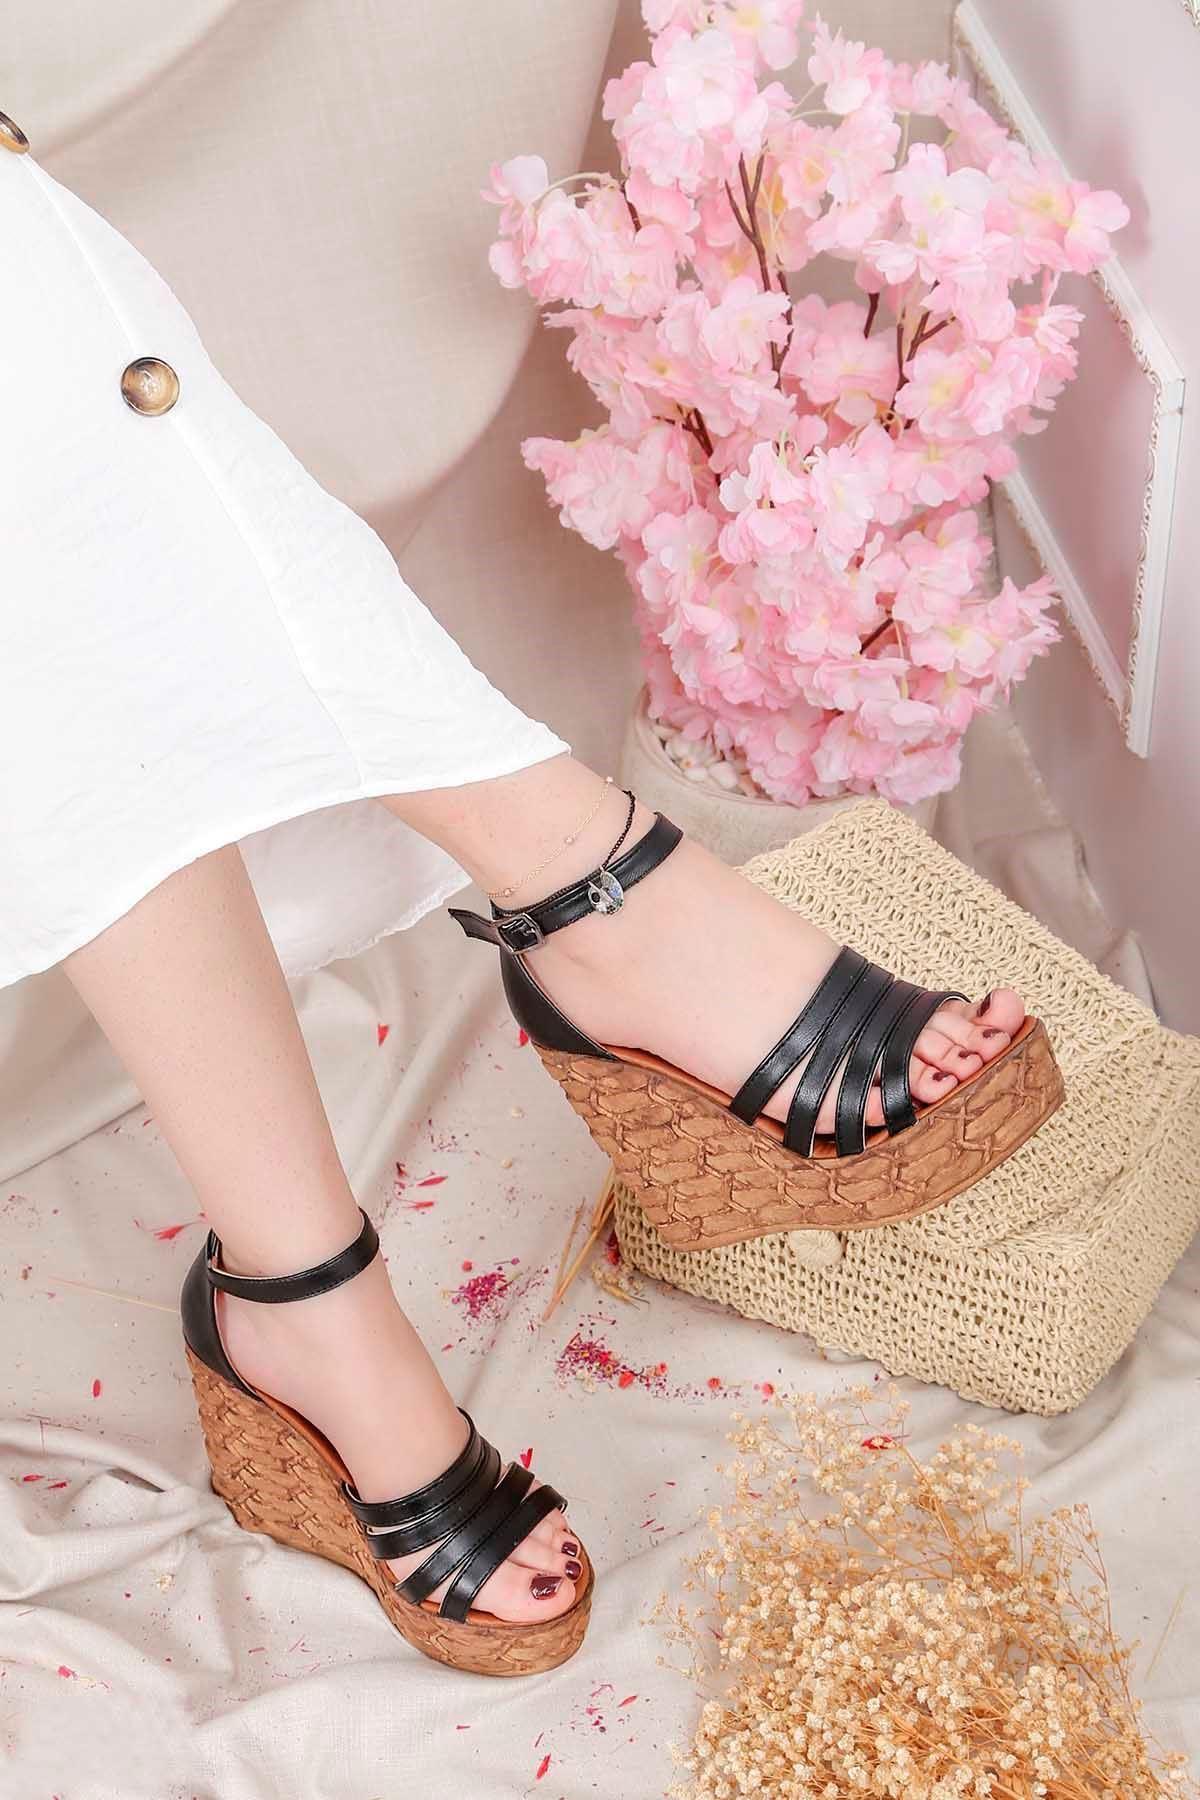 Frm-004 Yüksek Taban Sandalet Siyah Deri